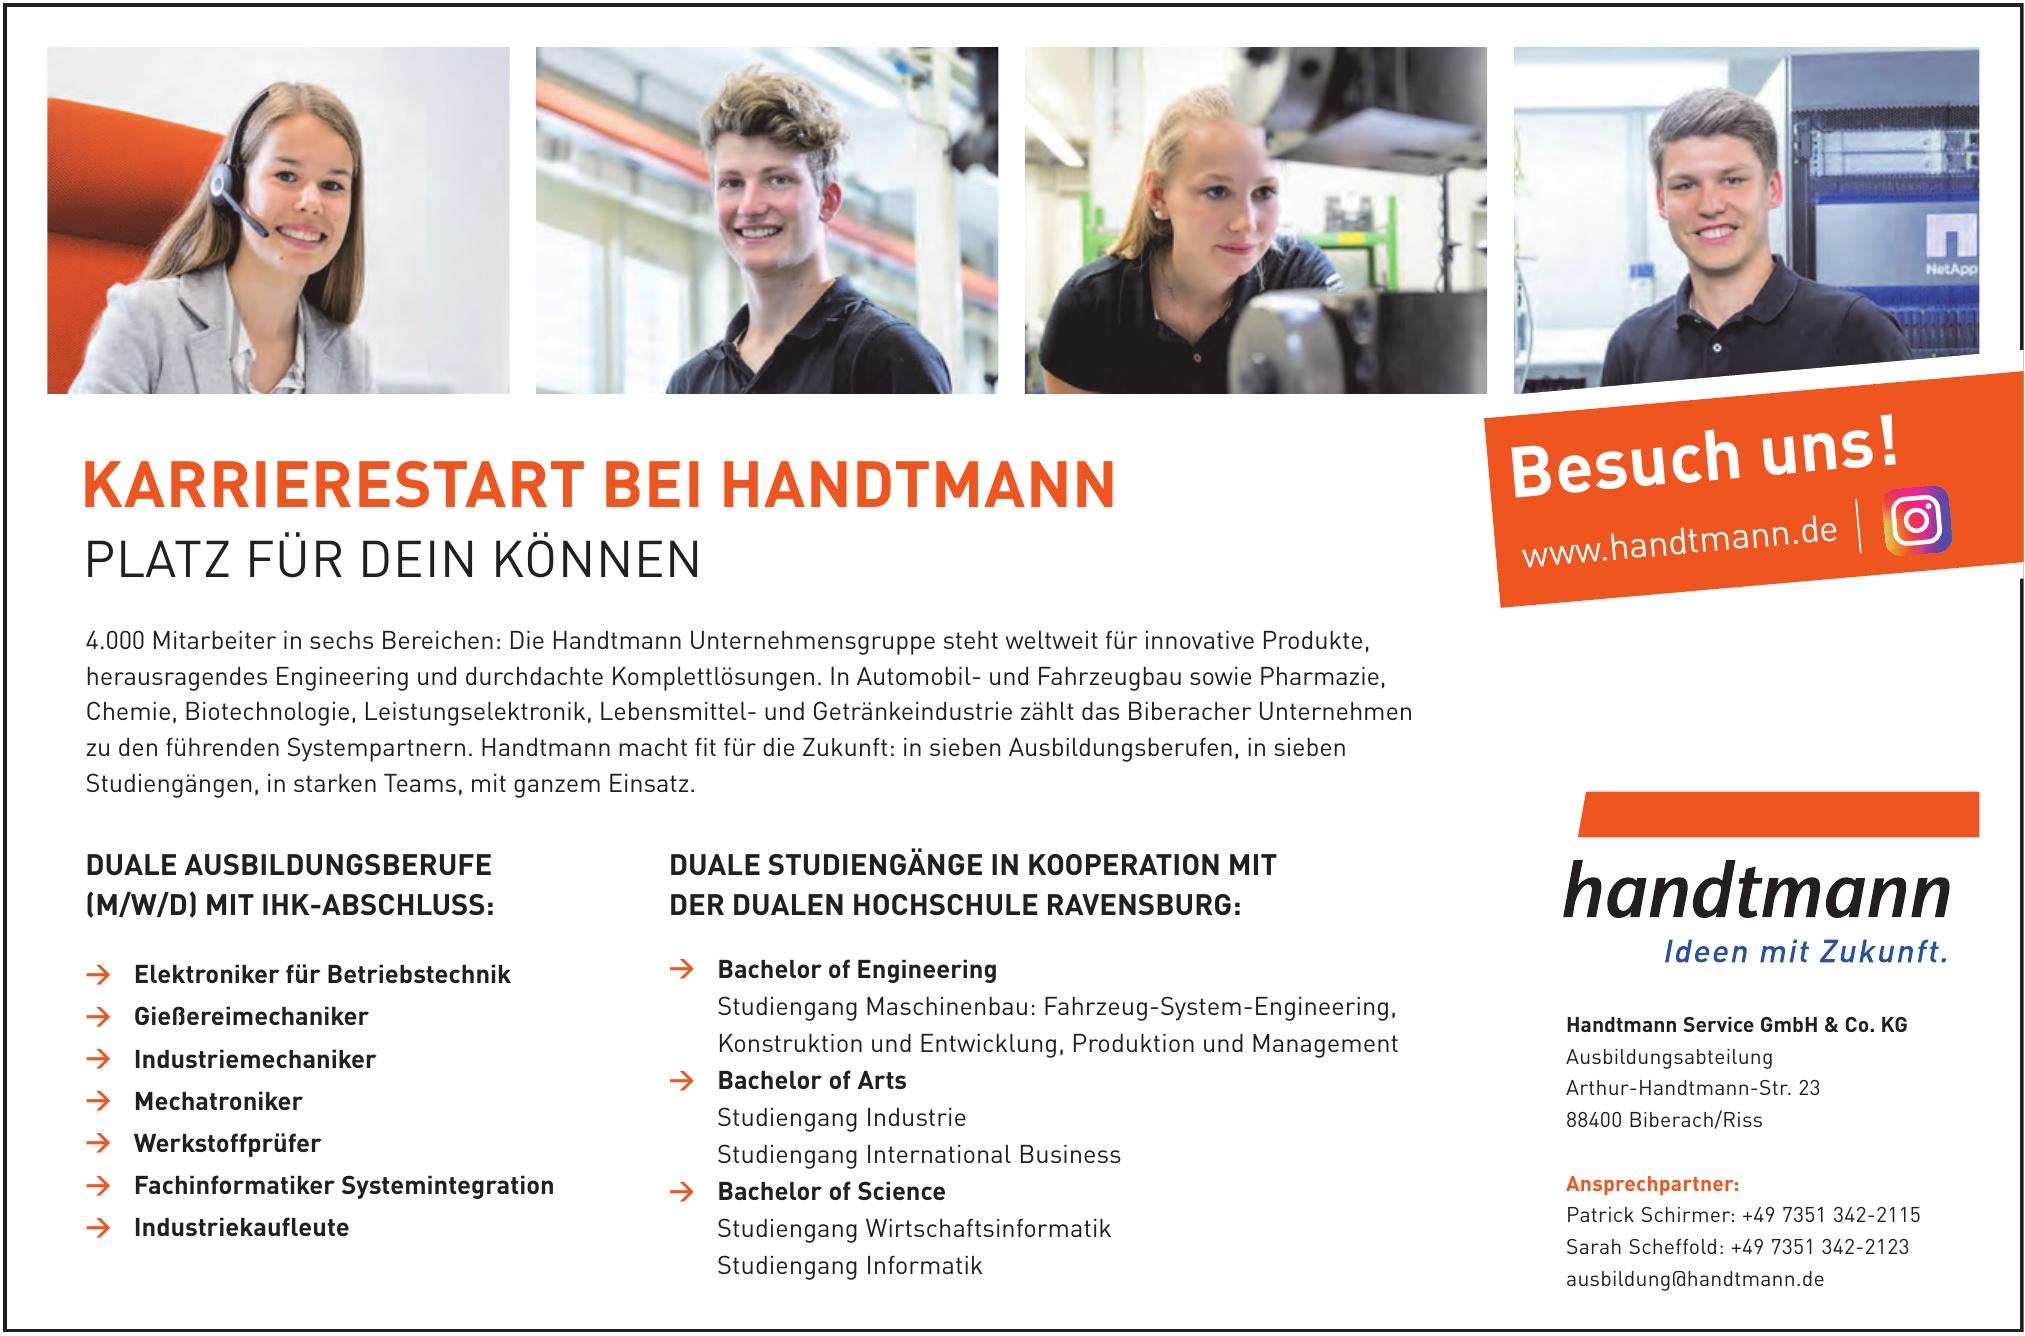 Handtmann Service GmbH & Co. KG